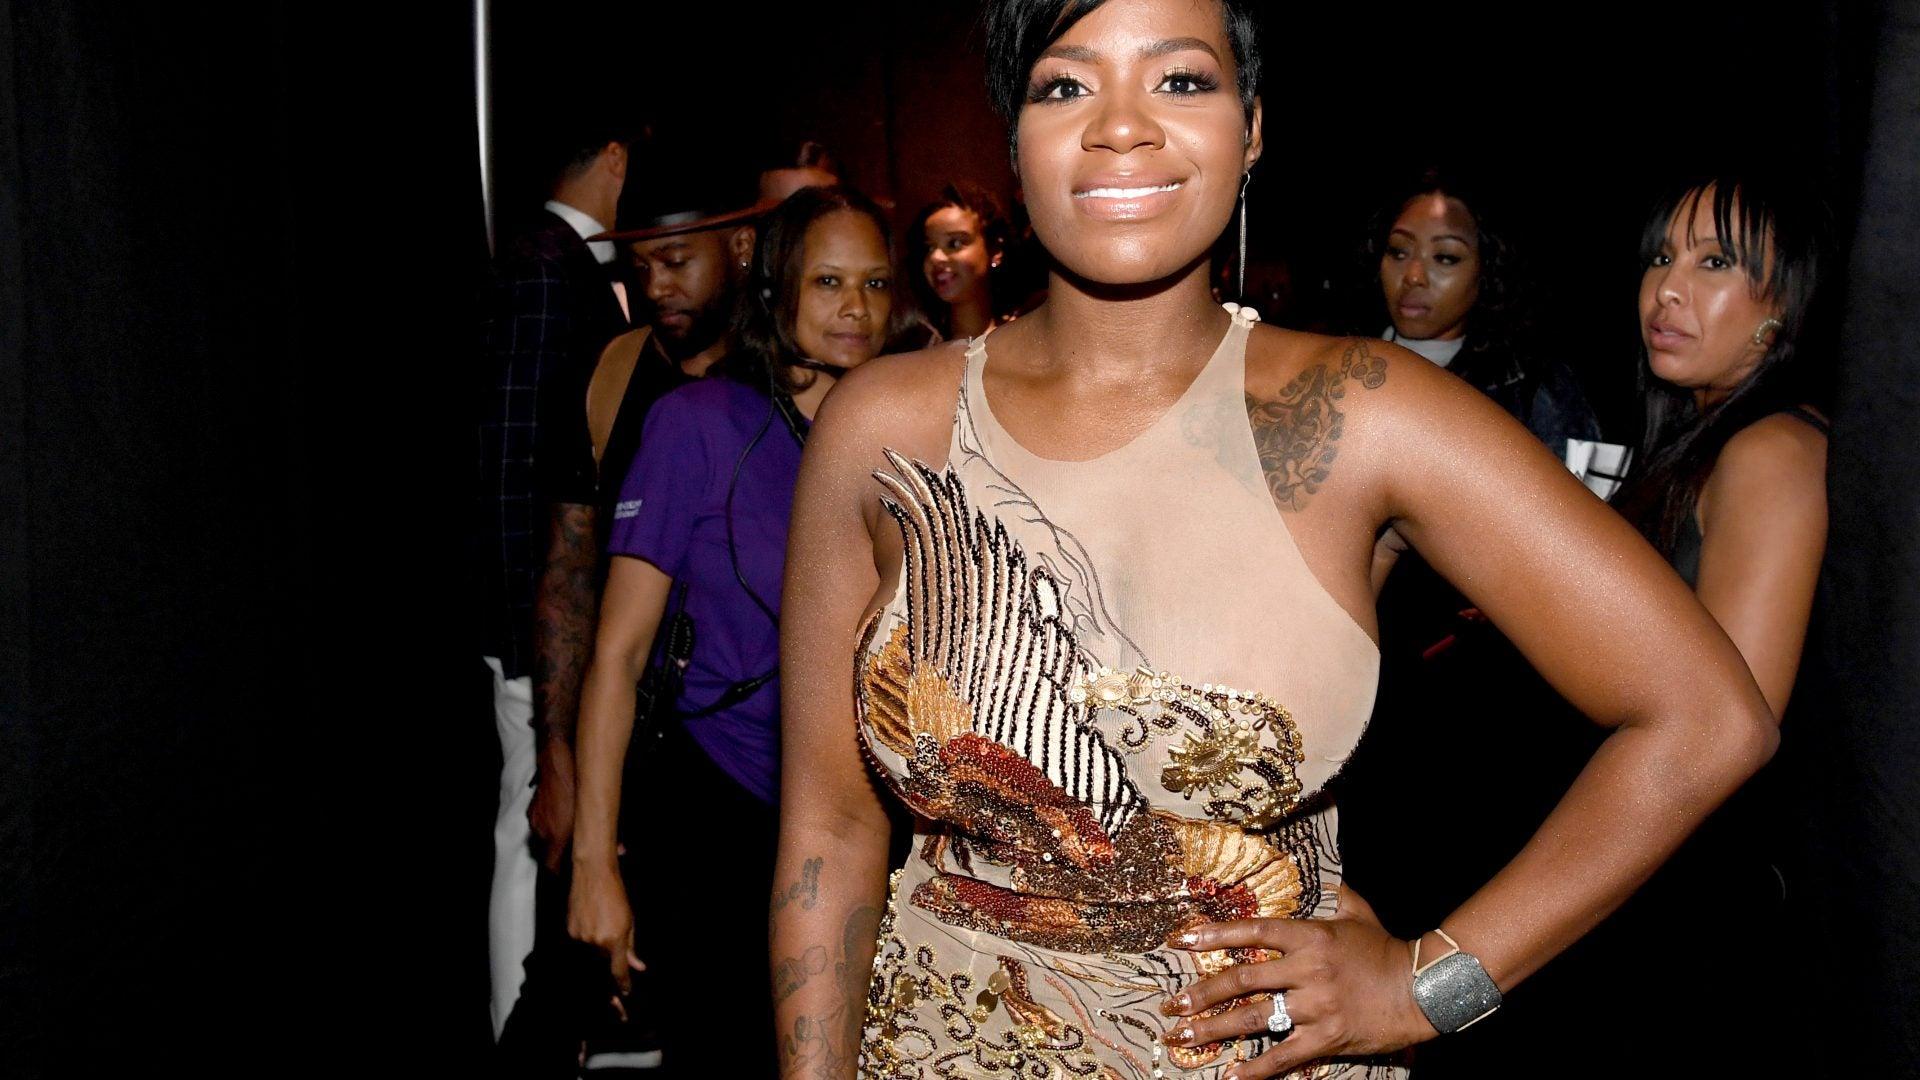 Fantasia Celebrates Her Daughter Zion's 18th Birthday